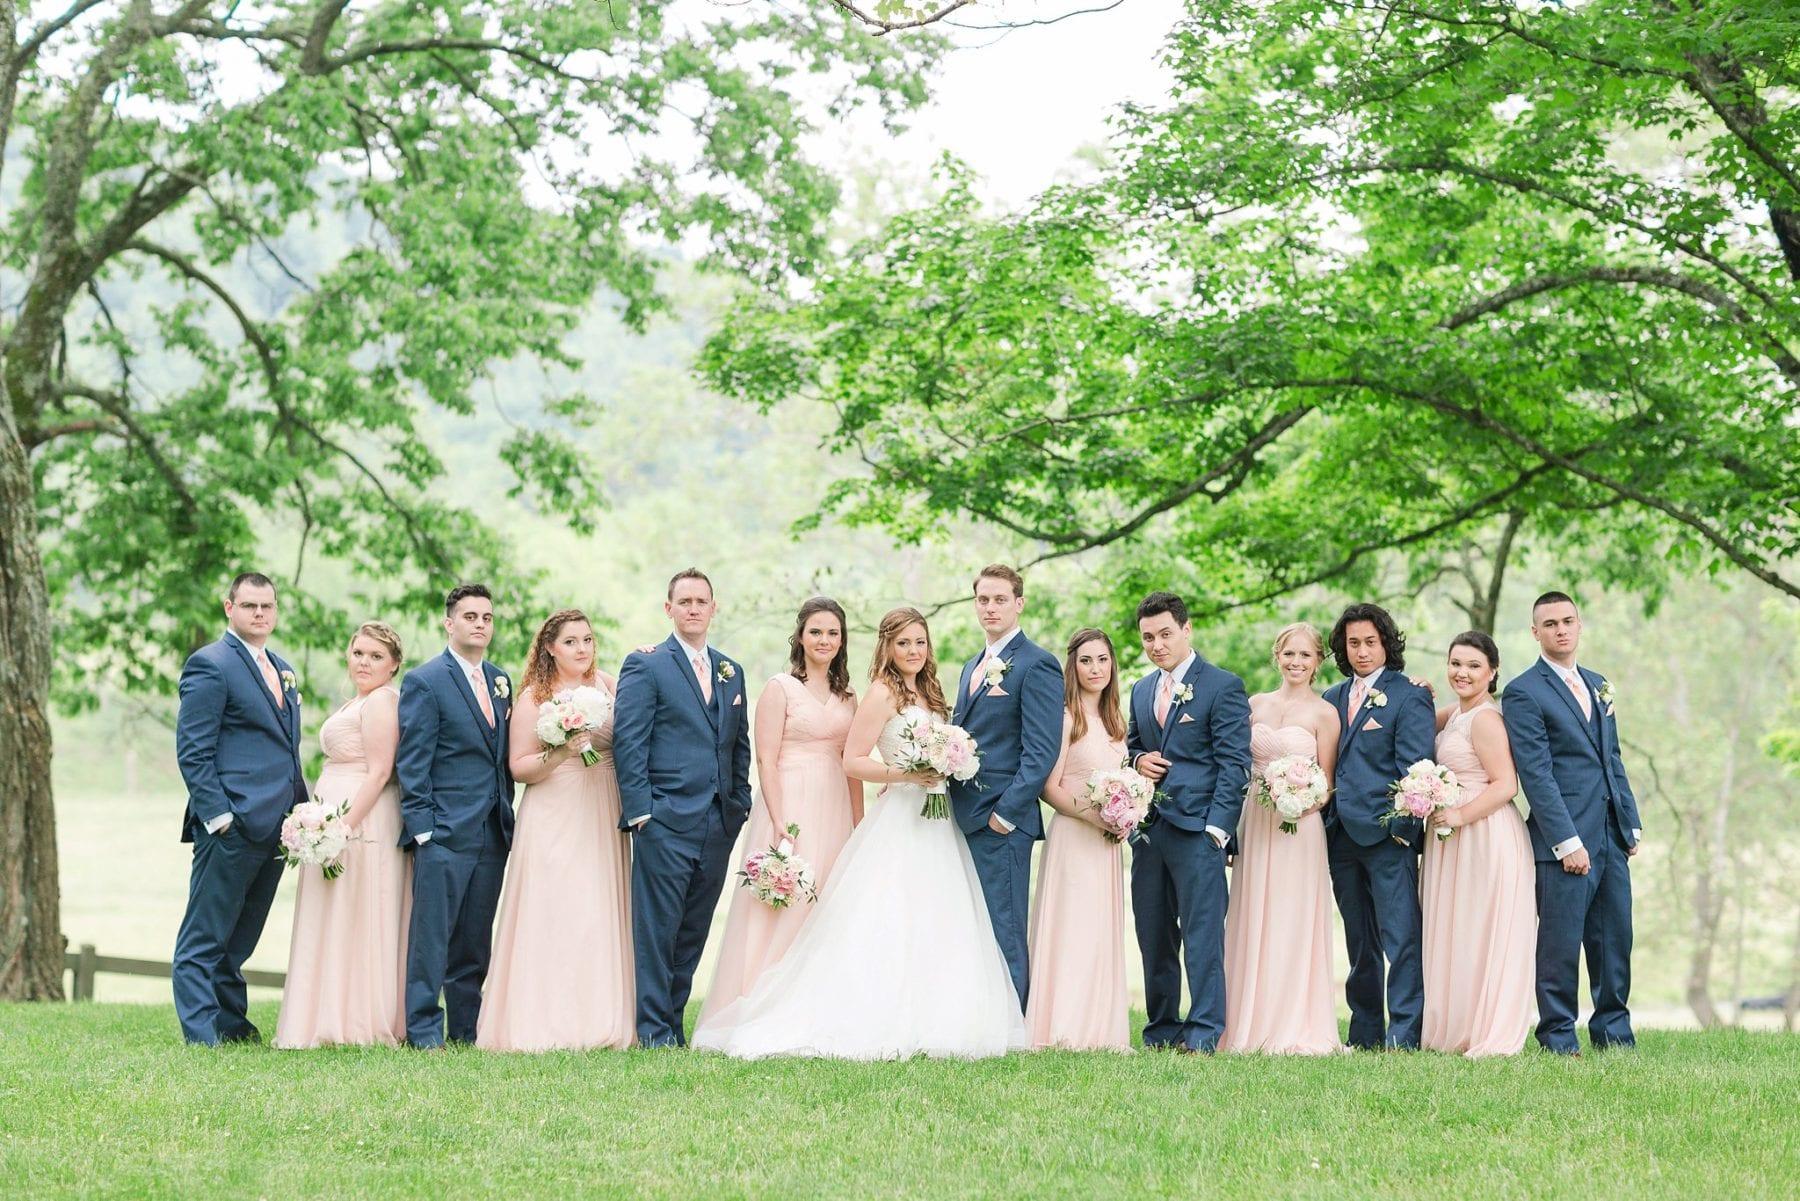 Justin & Megan Big Spring Farm Wedding Photos-141.jpg